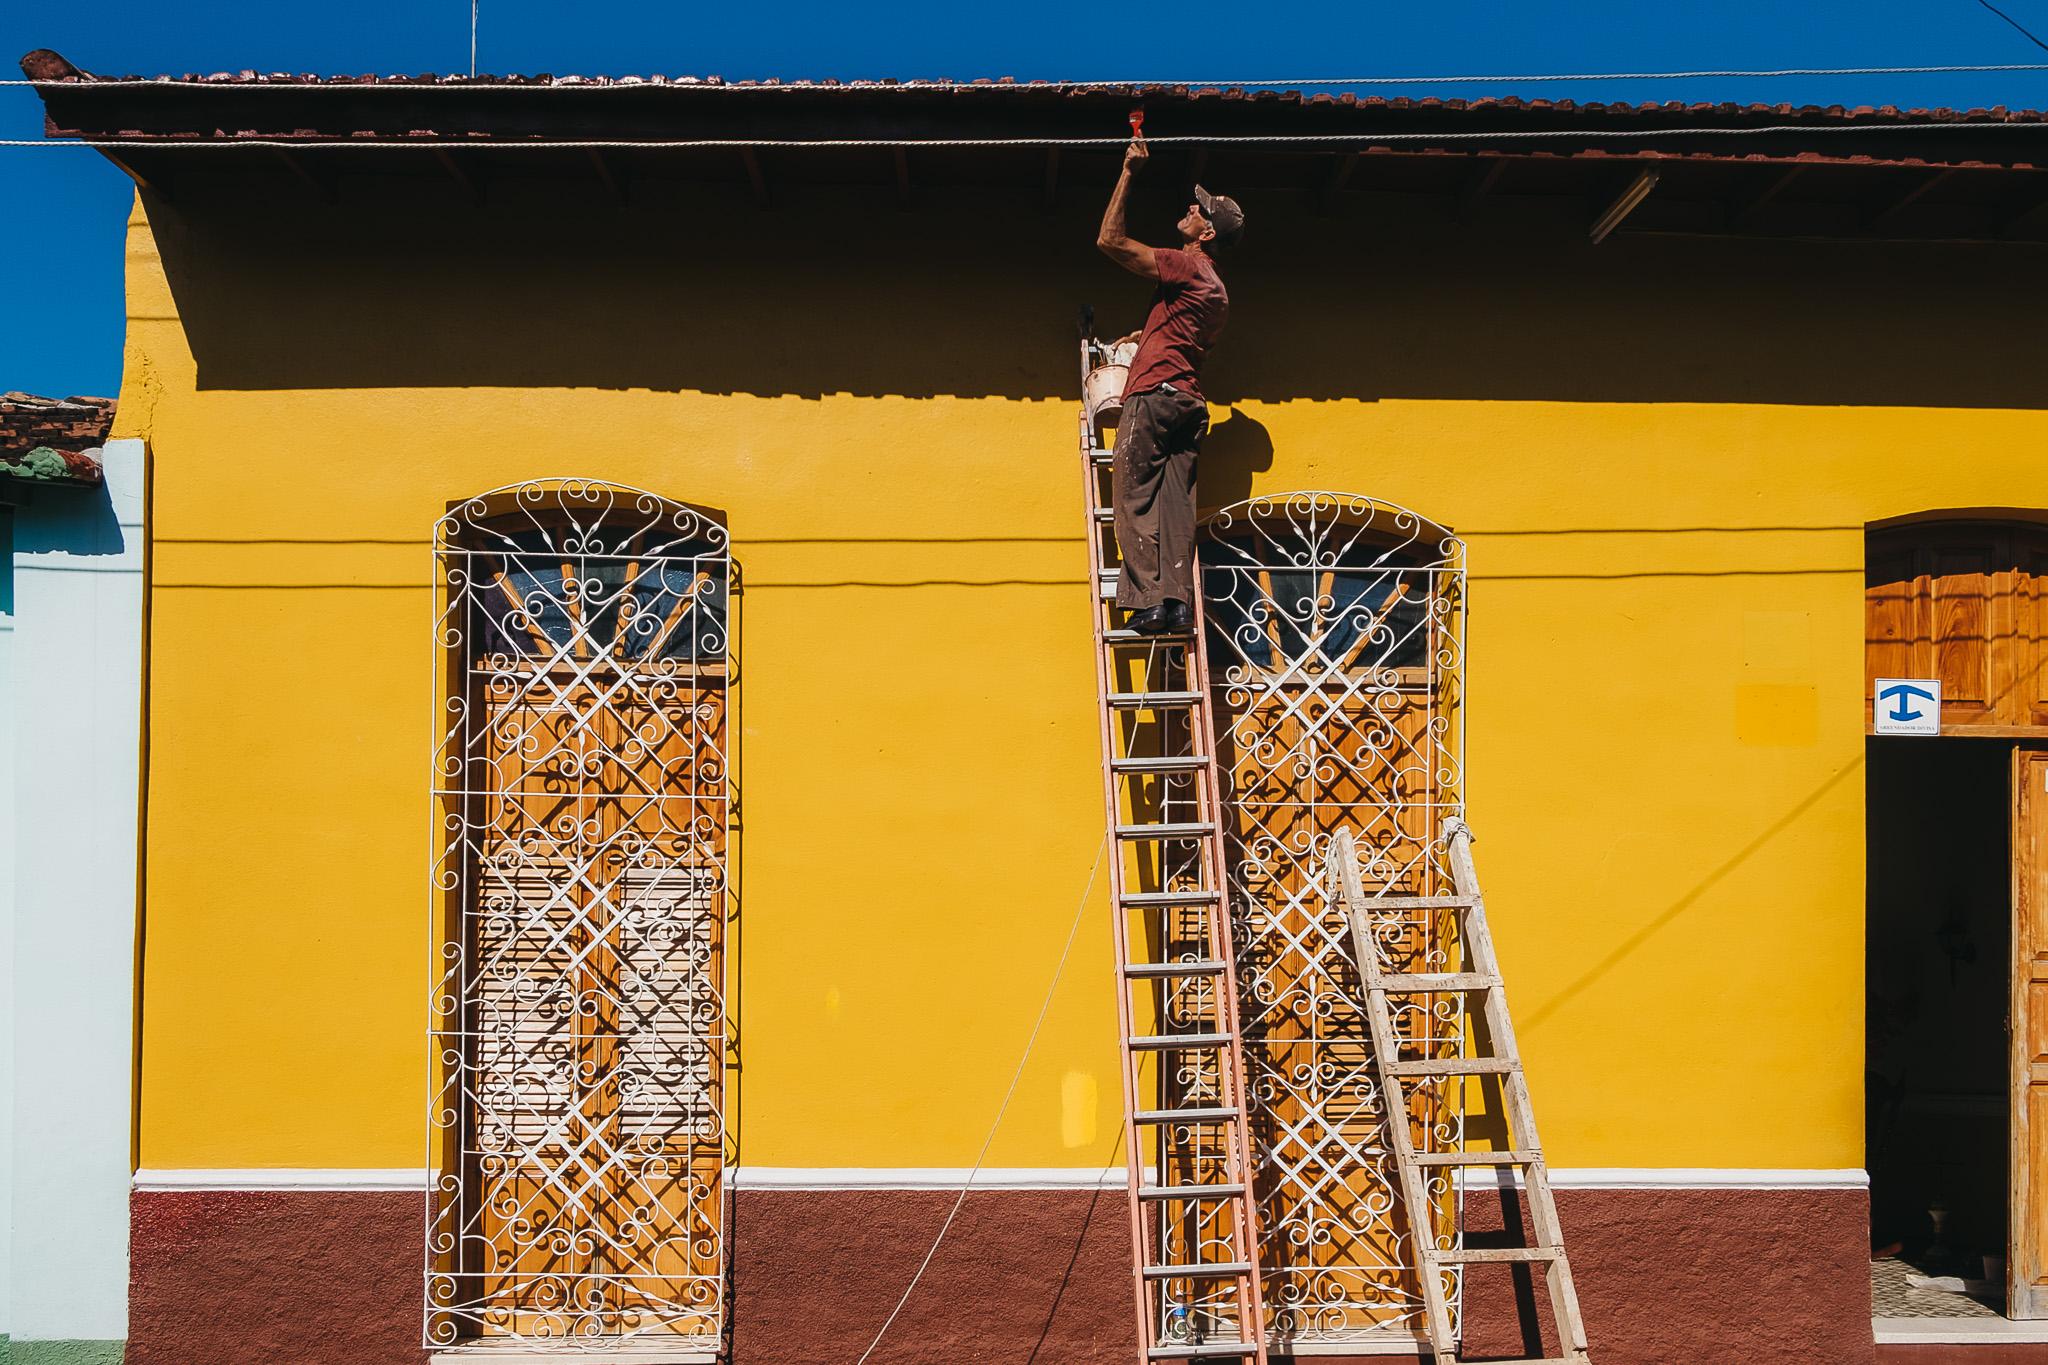 Cuba-2017-12-Trinidad-0028.jpg